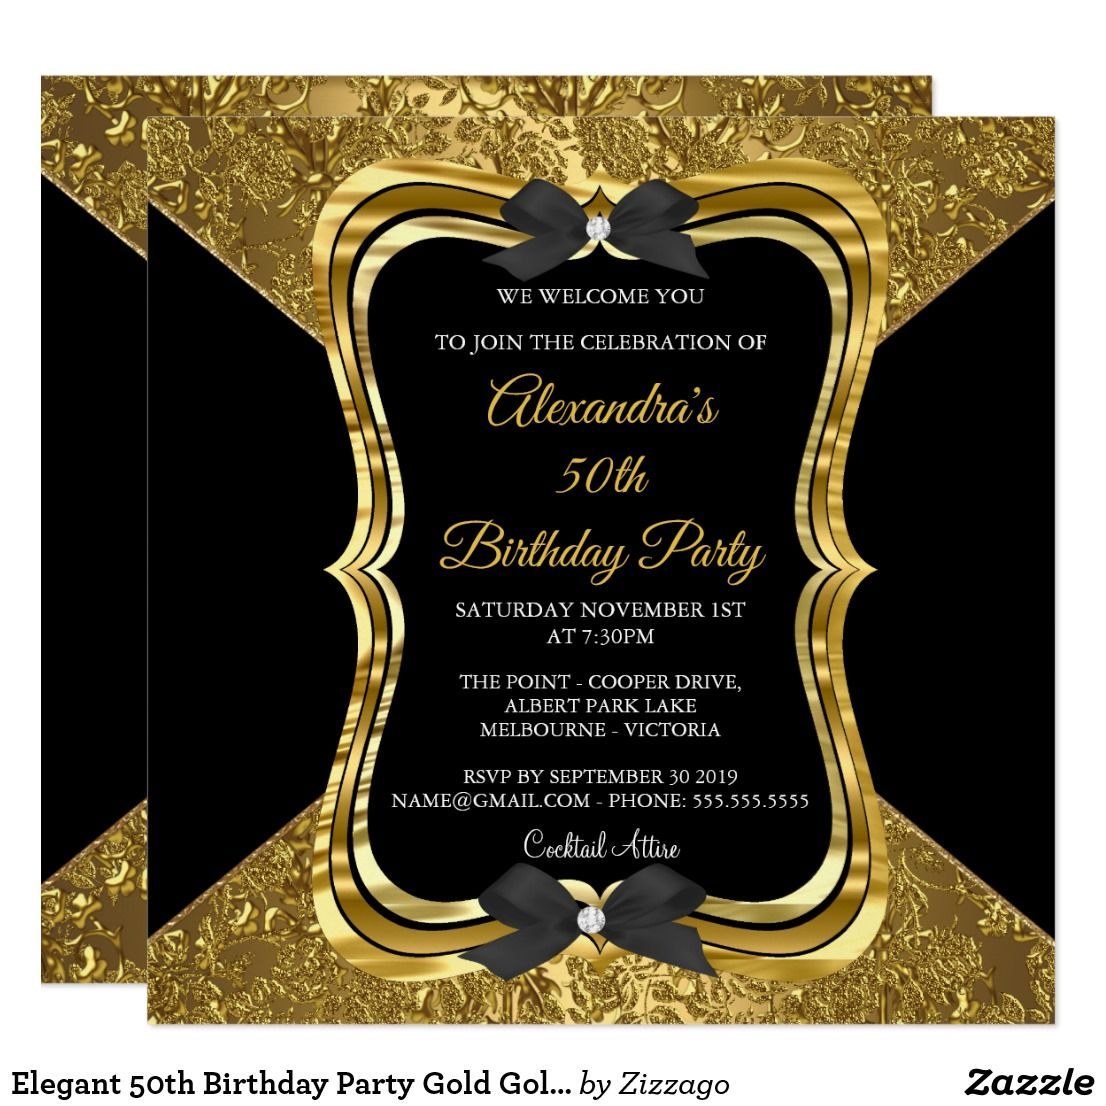 Elegant 50th birthday party gold golden black invitation happy elegant 50th birthday party gold golden black card elegant 50th birthday party gold golden black ornate floral black bows custom invitations filmwisefo